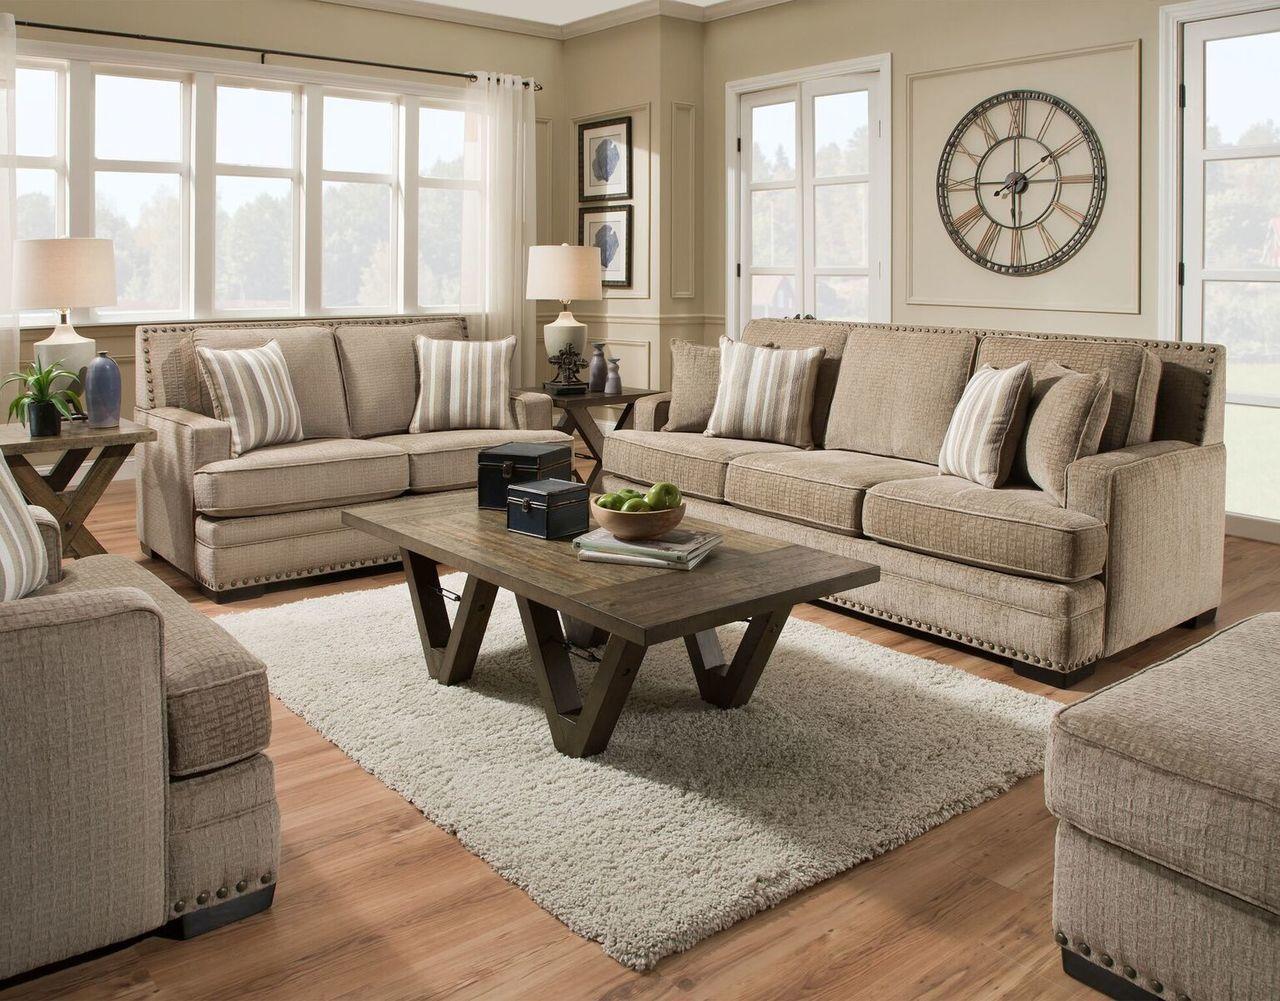 Living Room Sofa And Loveseat Sets Italian Furniture Design Albany Ultimate Mushroom Set 488 Savvy Discount